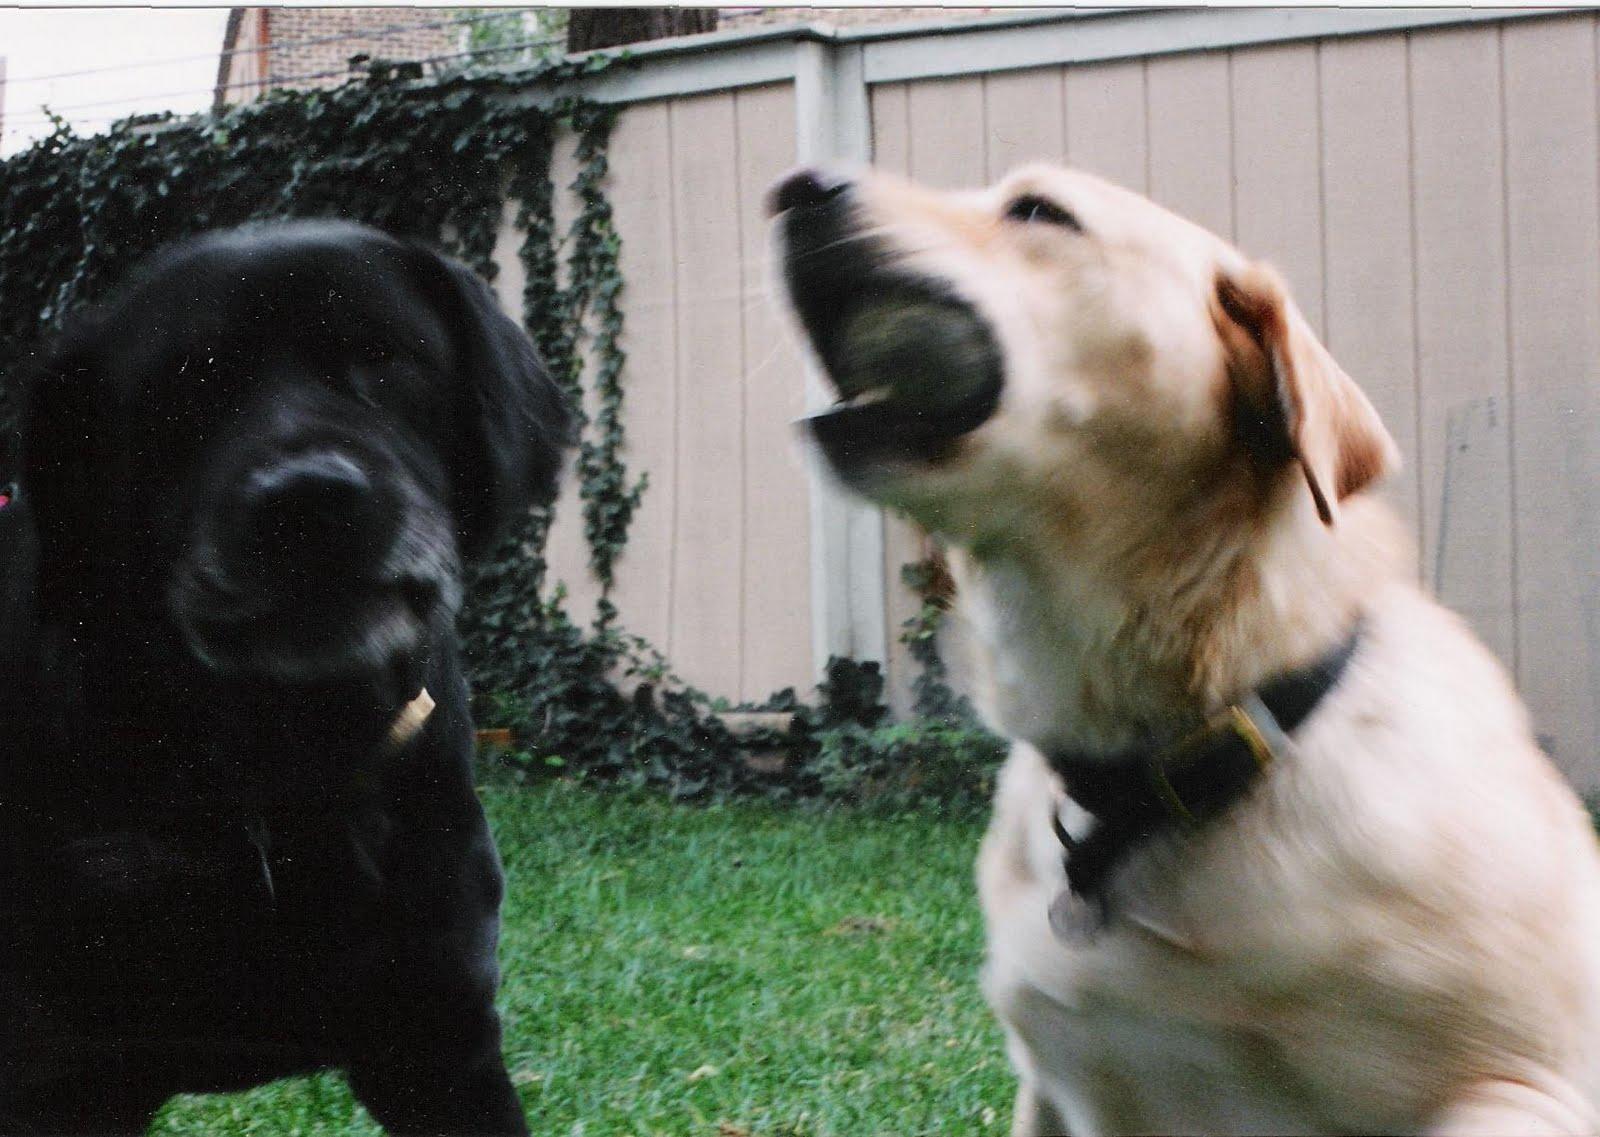 [Ursa,Maxine,ball,play,blur,jpeg]